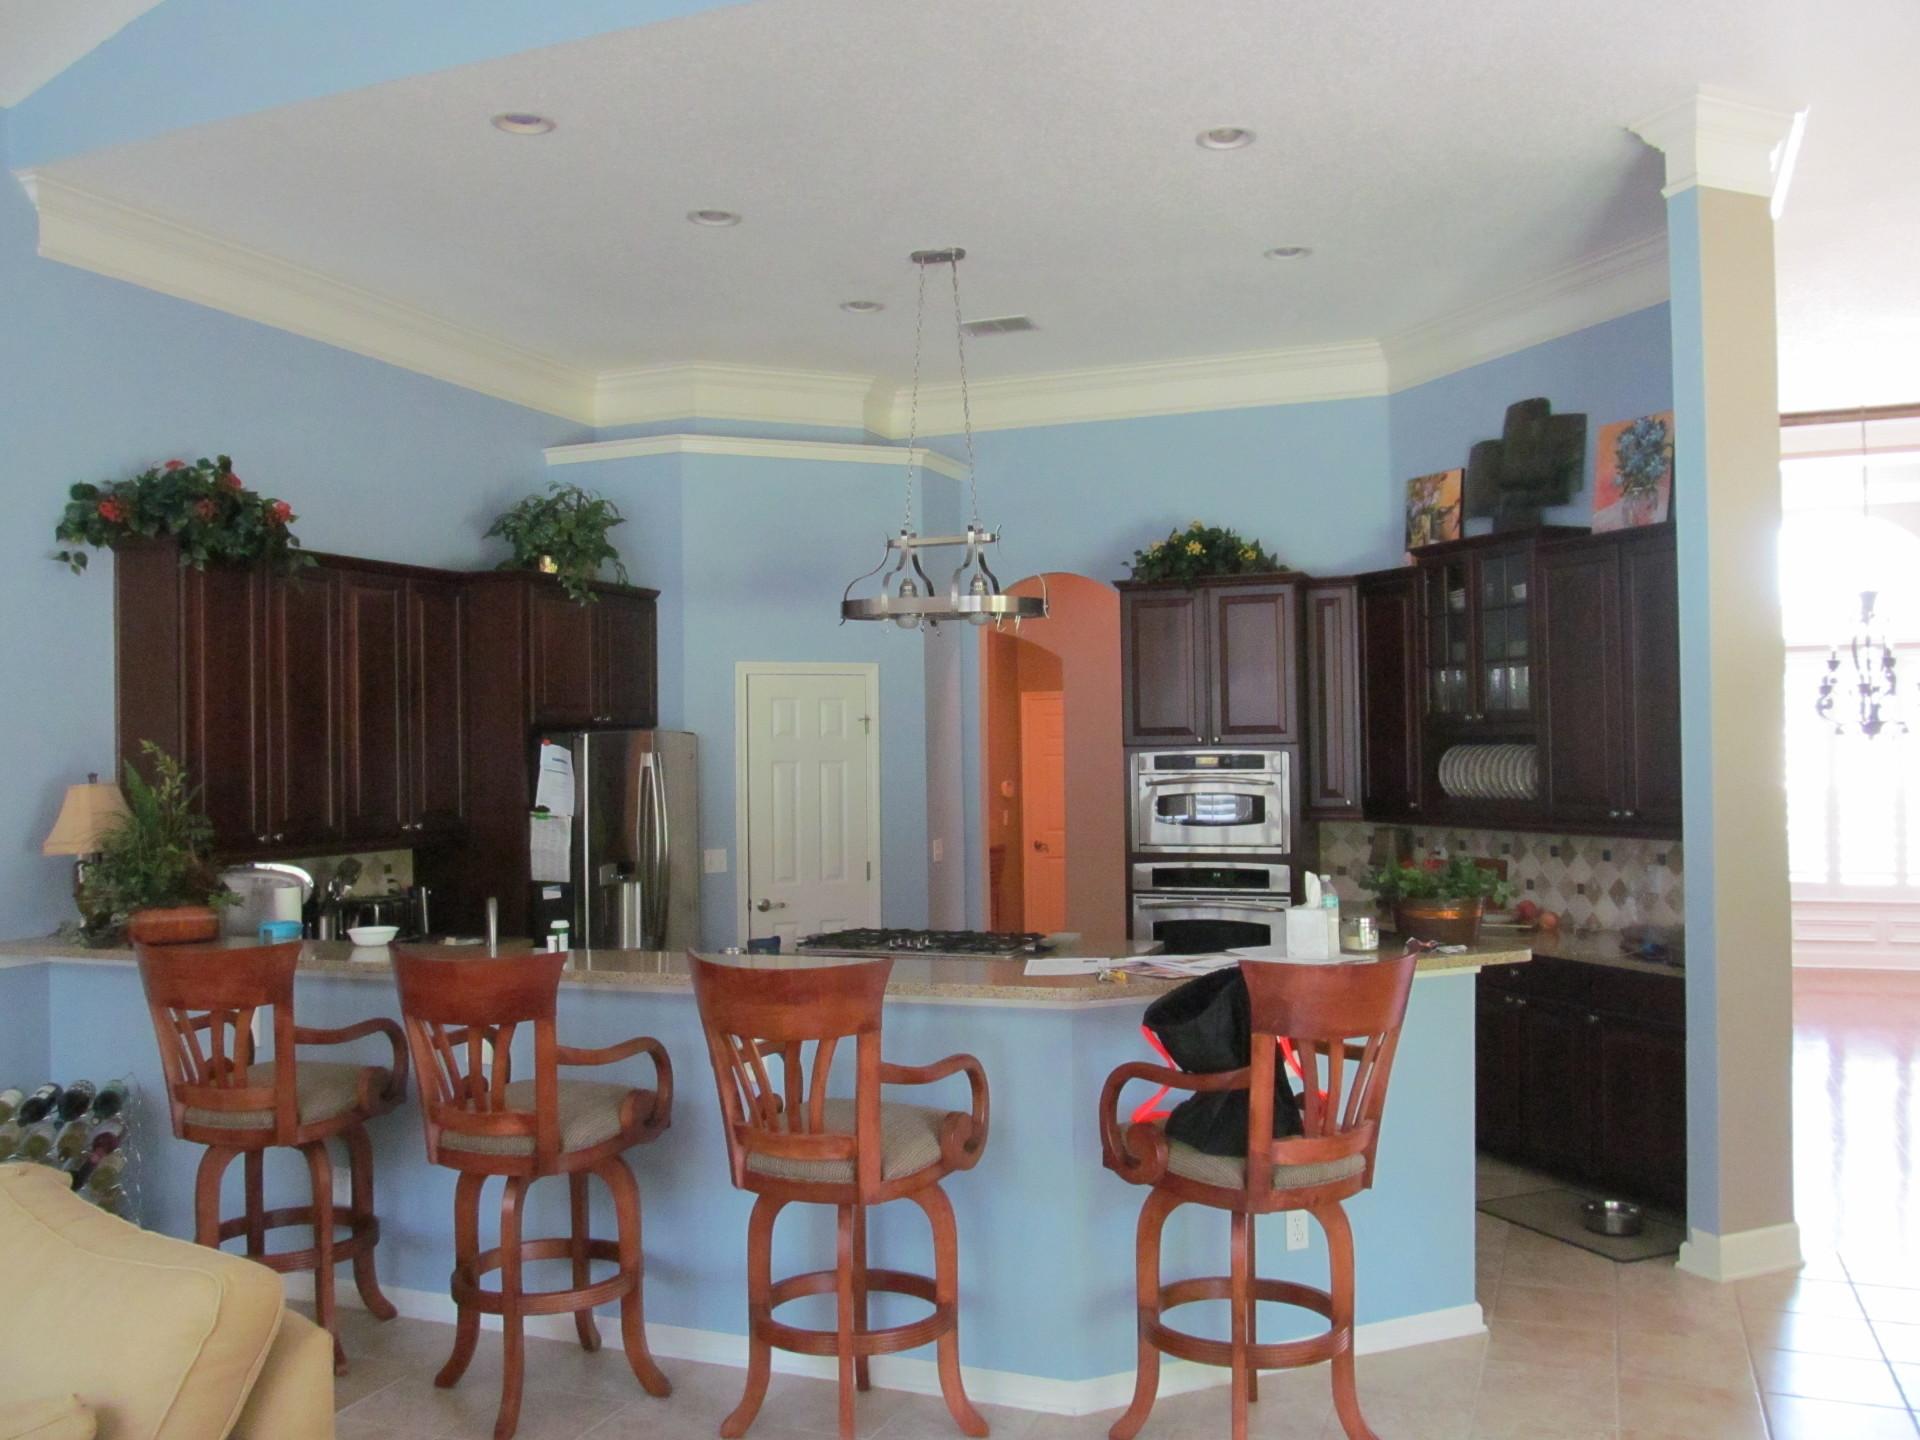 Residential painters jacksonville interior painting home - Interior painting jacksonville fl ...